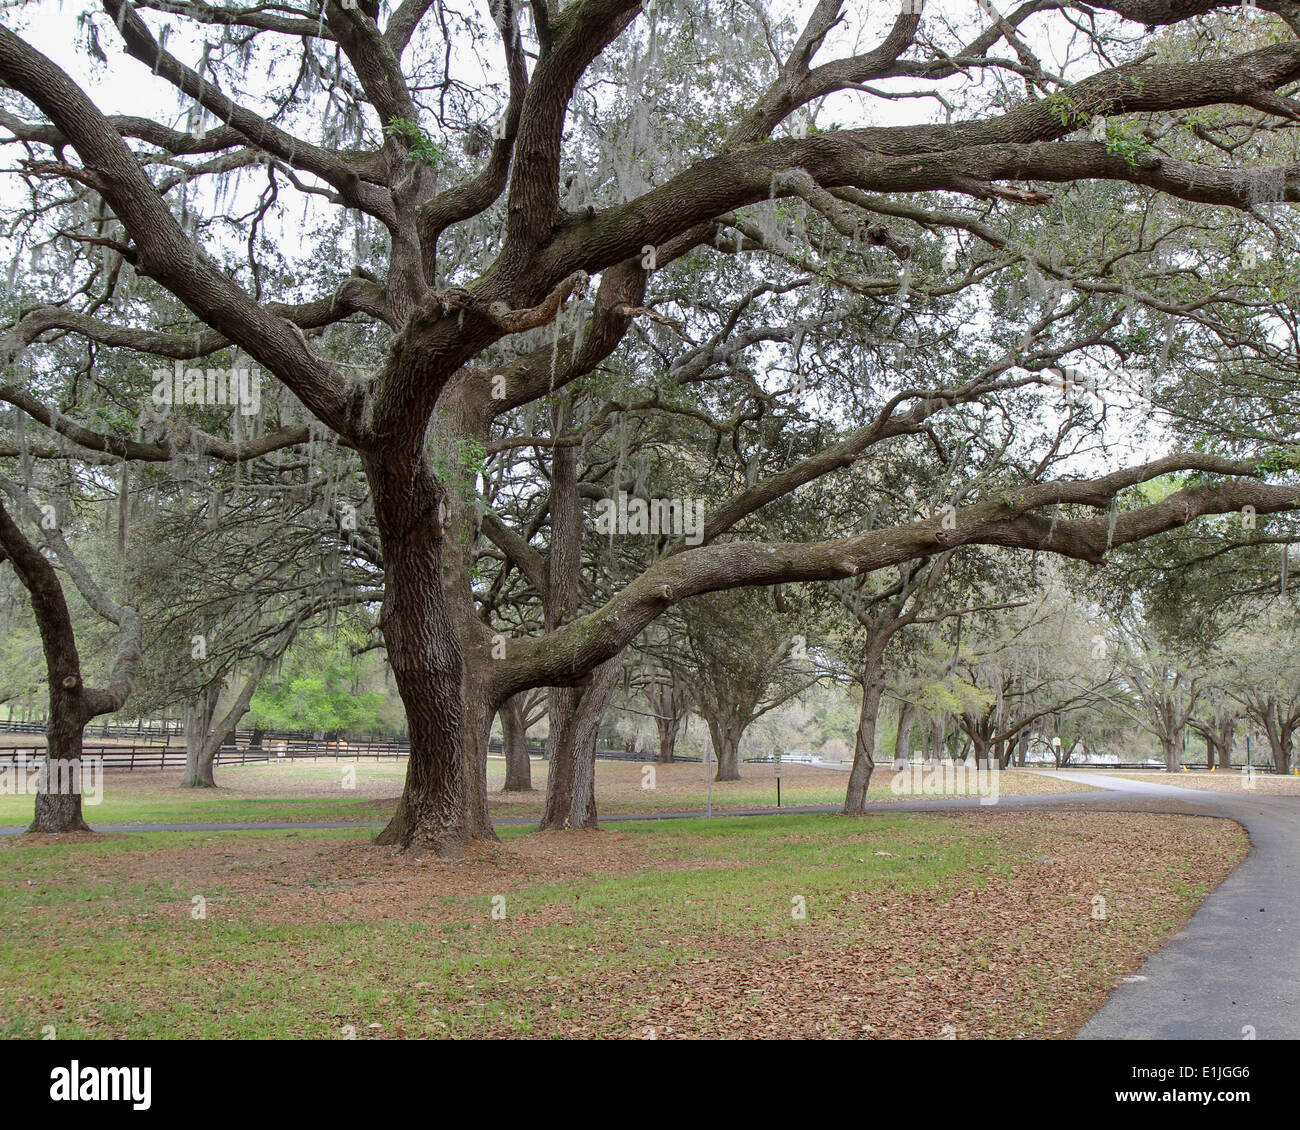 Live Oak Trees in Florida - Stock Image